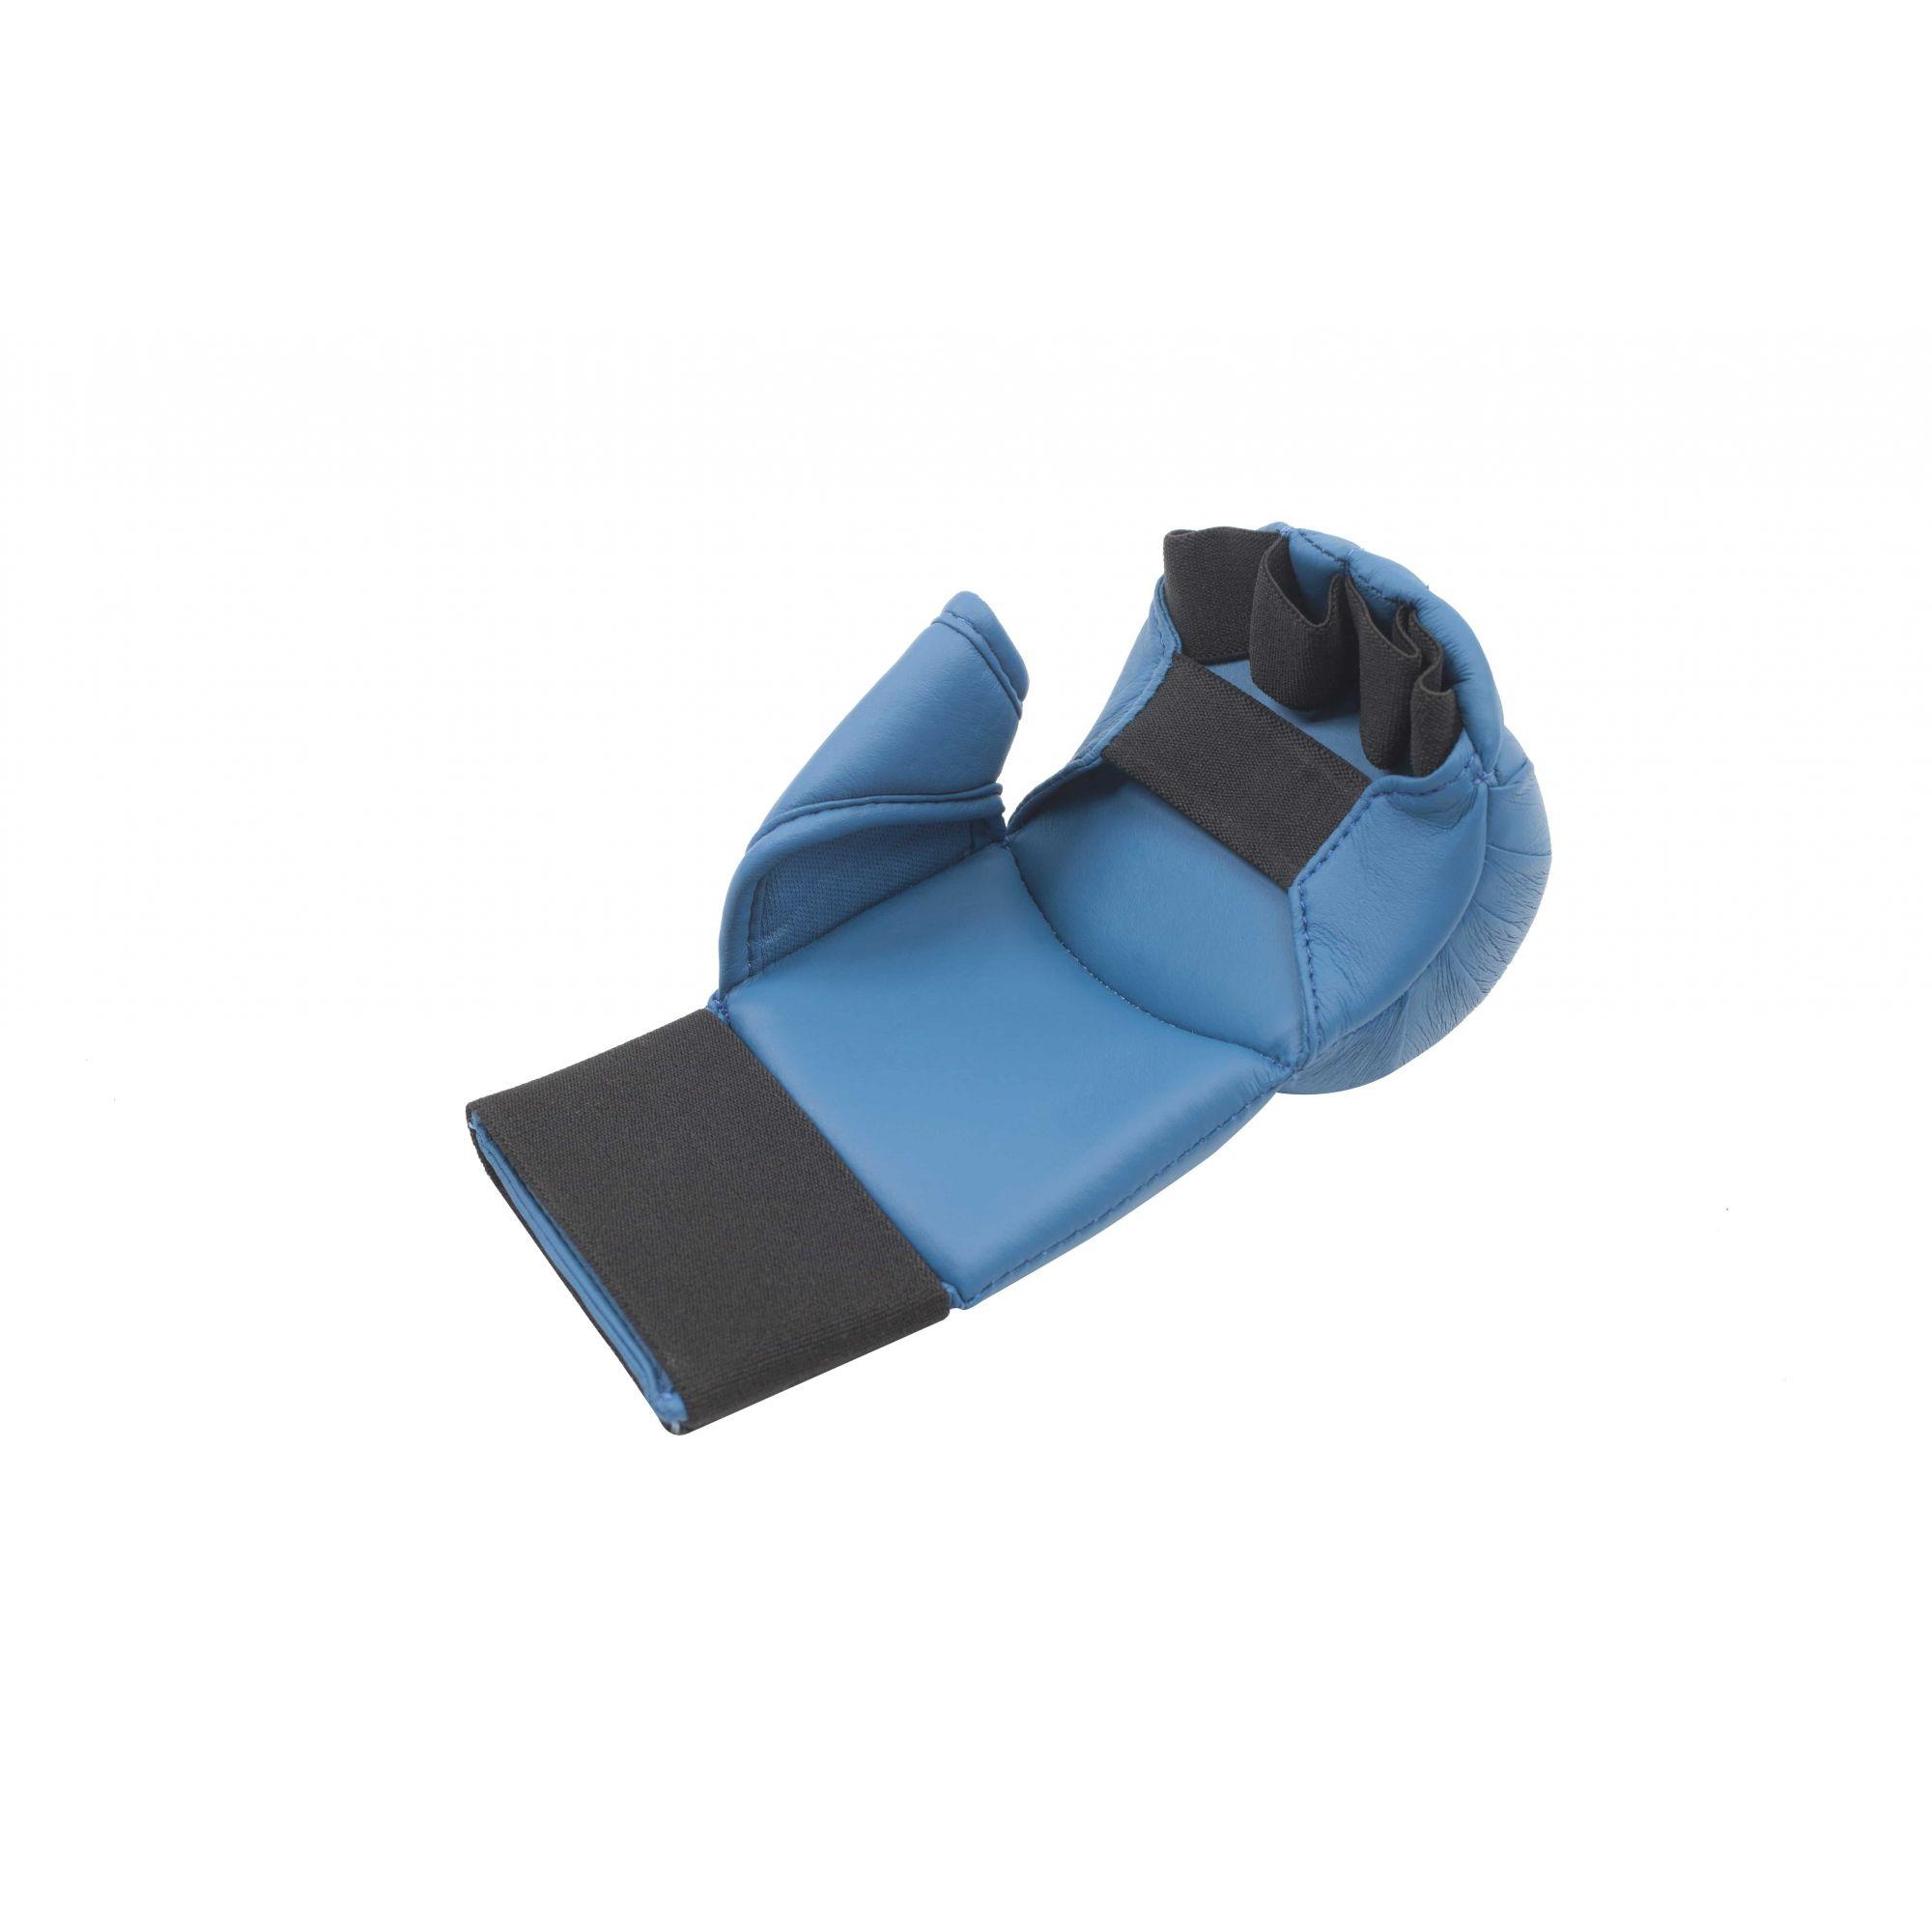 Luva de Karatê MKS Modelo 2018 Azul